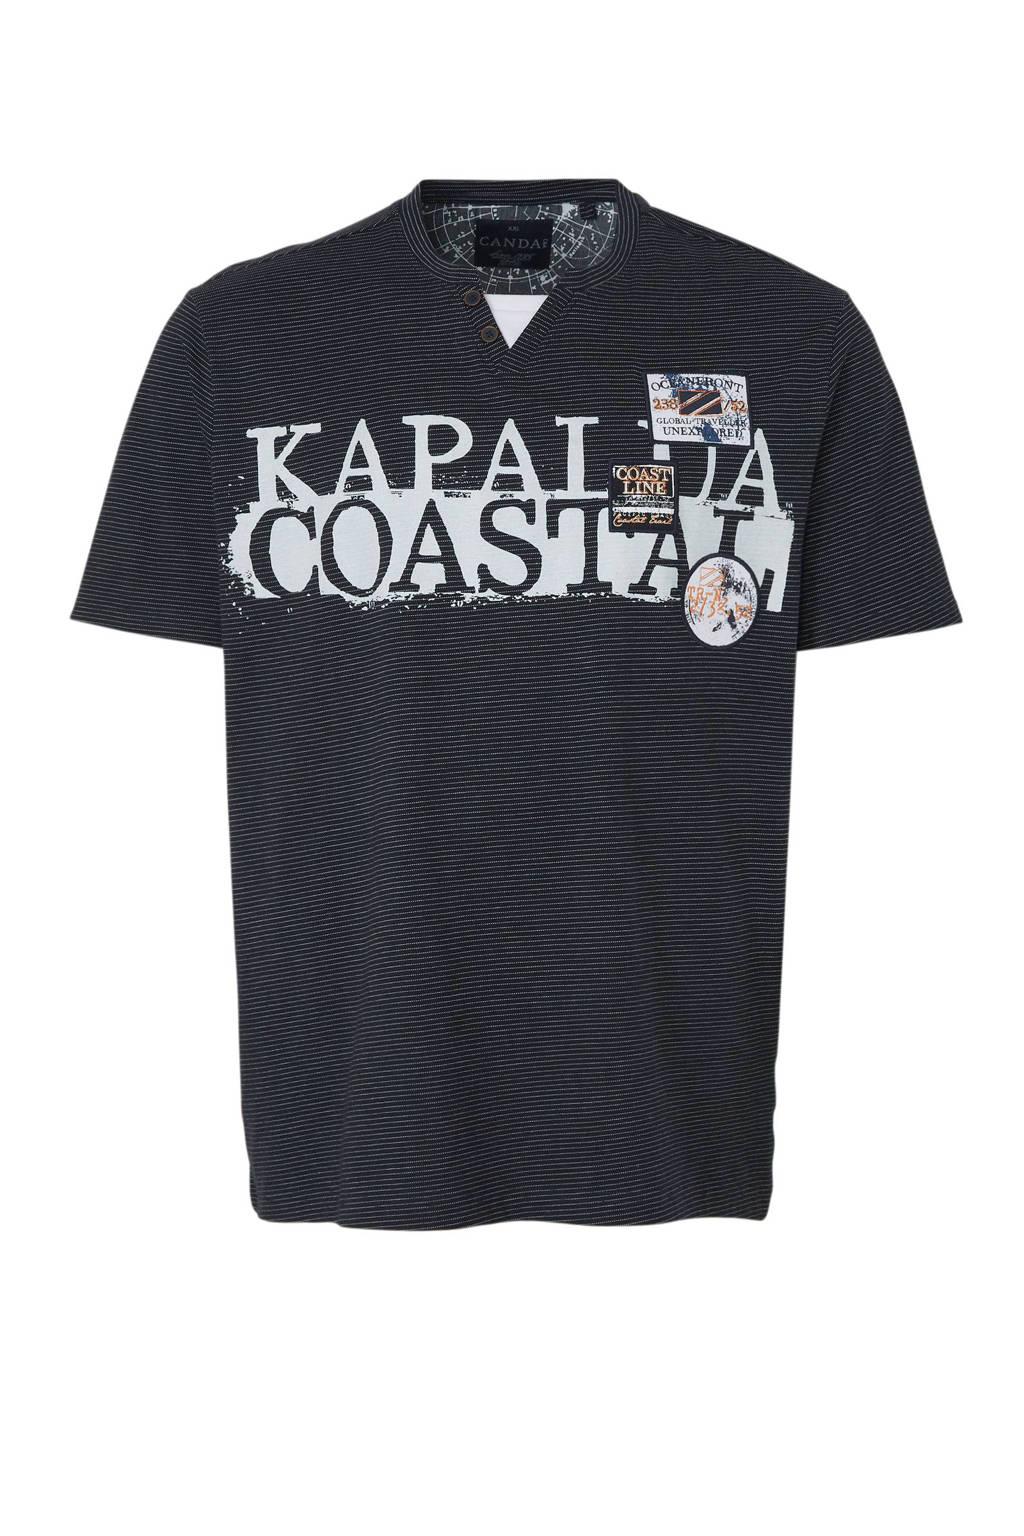 C&A XL Canda T-shirt, Donkerblauw